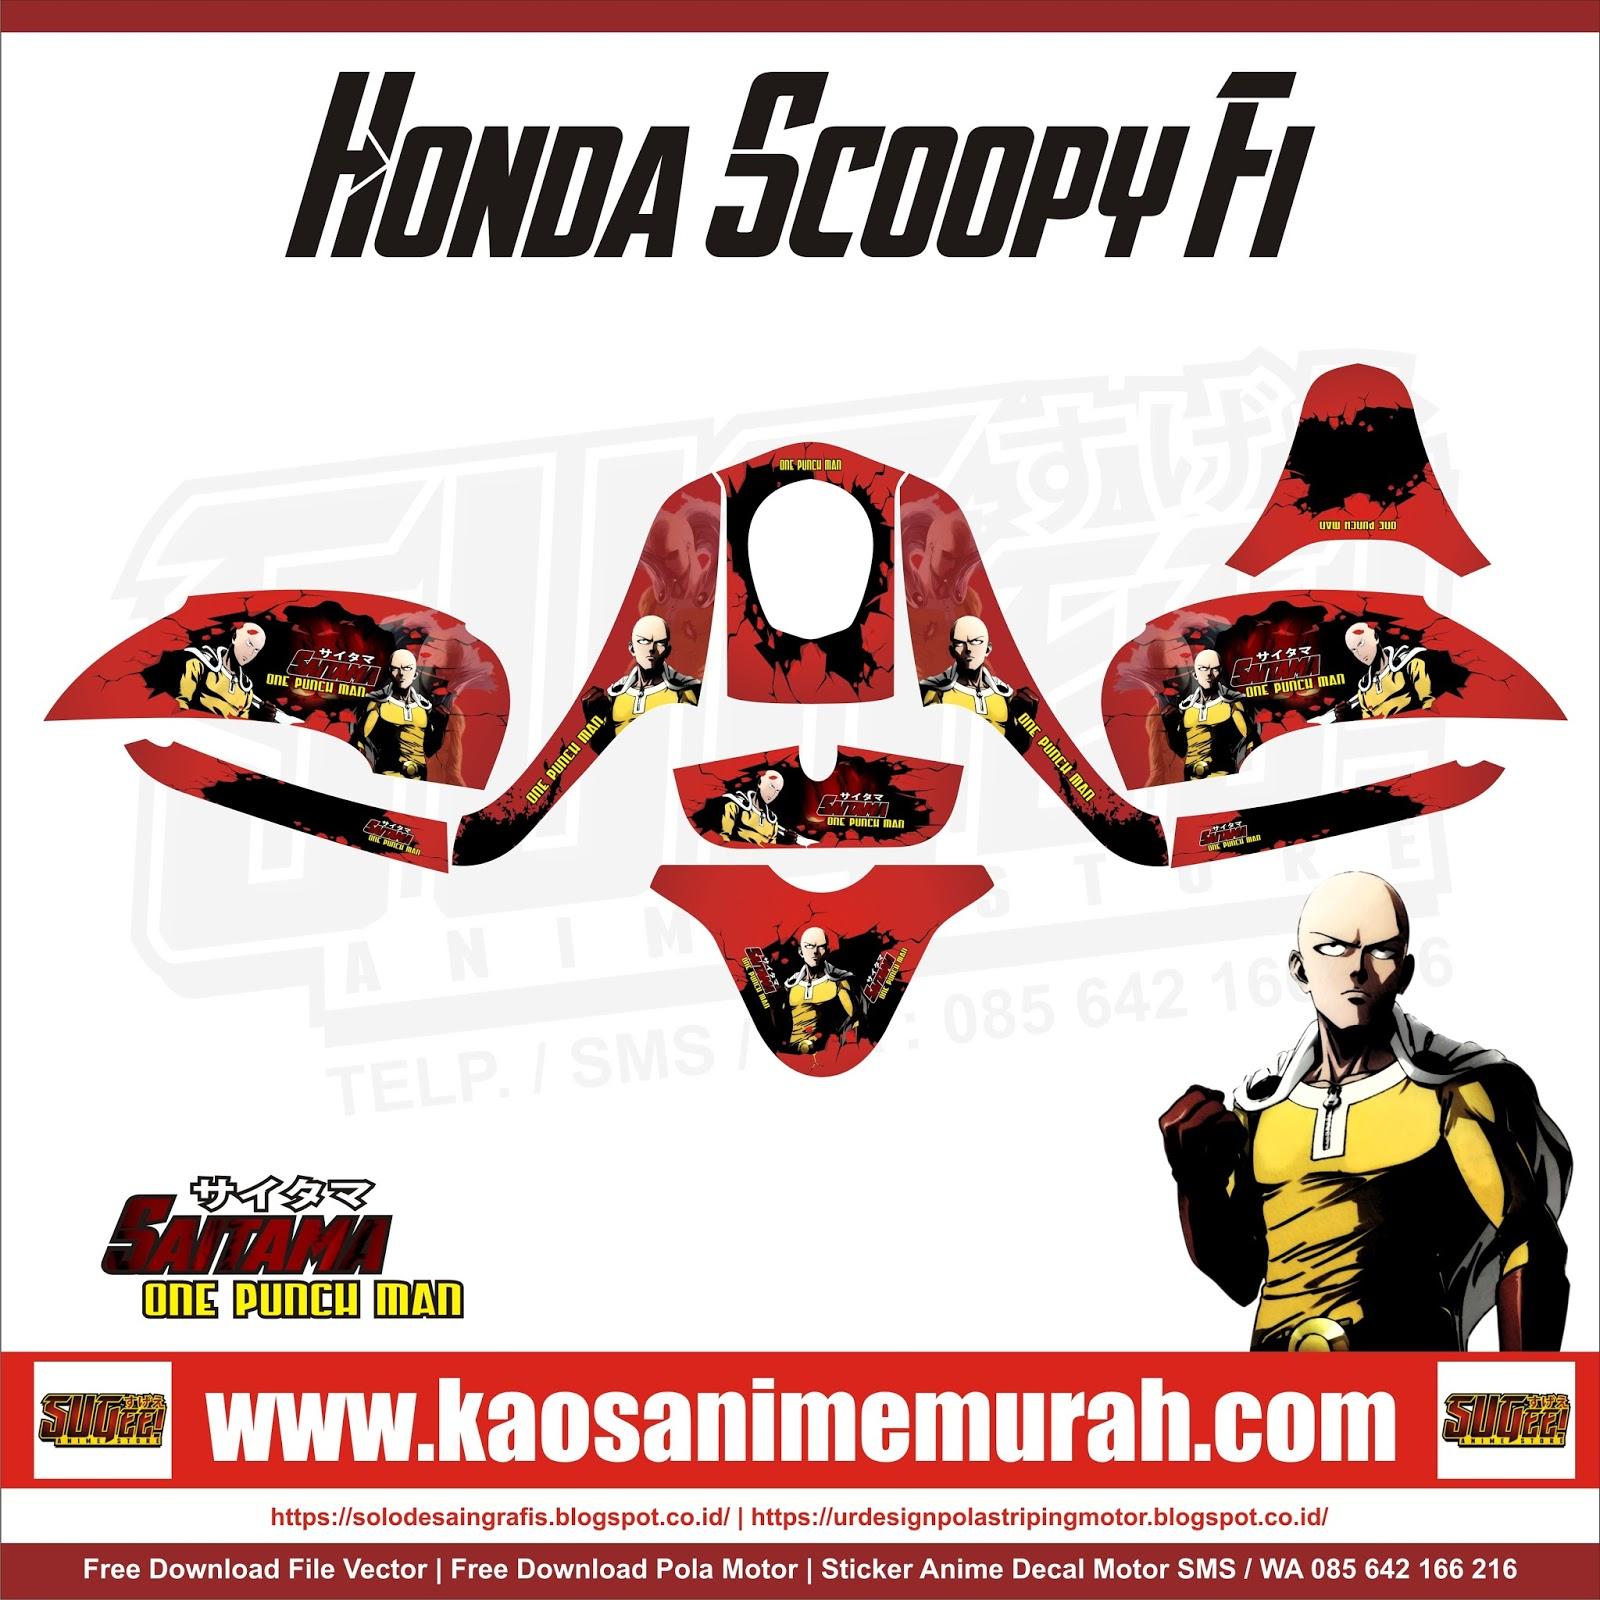 Honda Scoopy Fi Saitama OPM